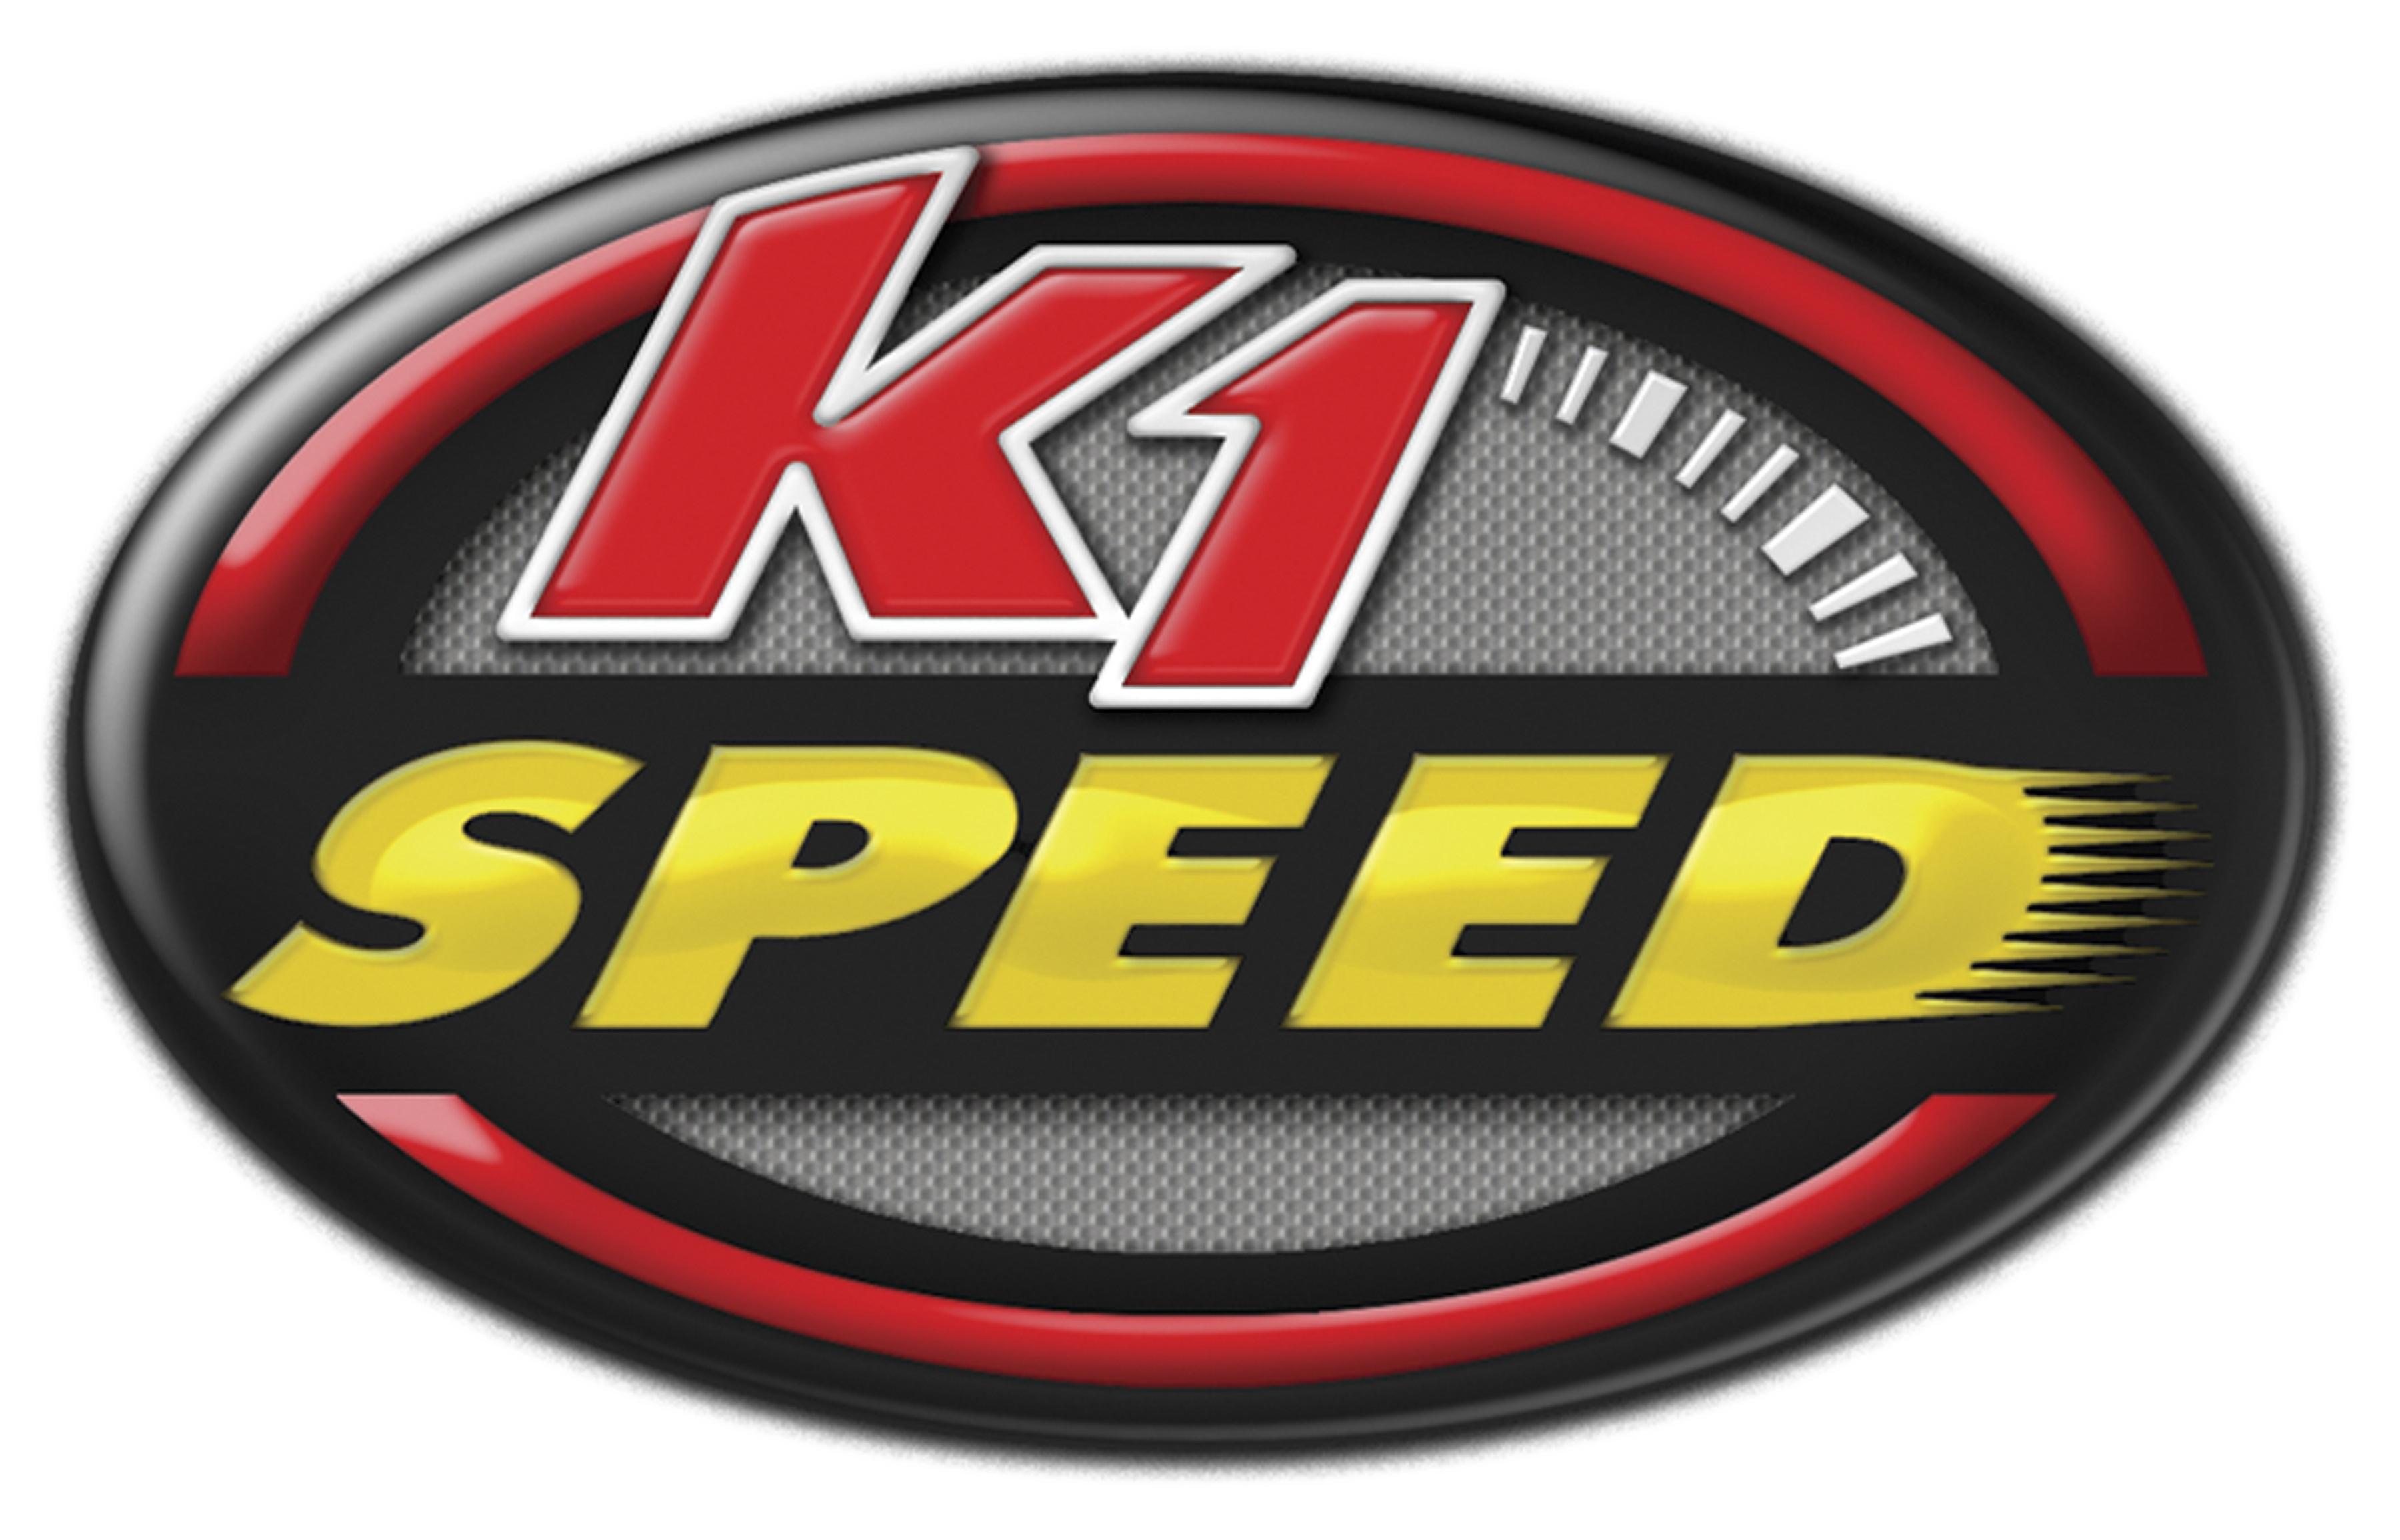 K1 speed coupon anaheim